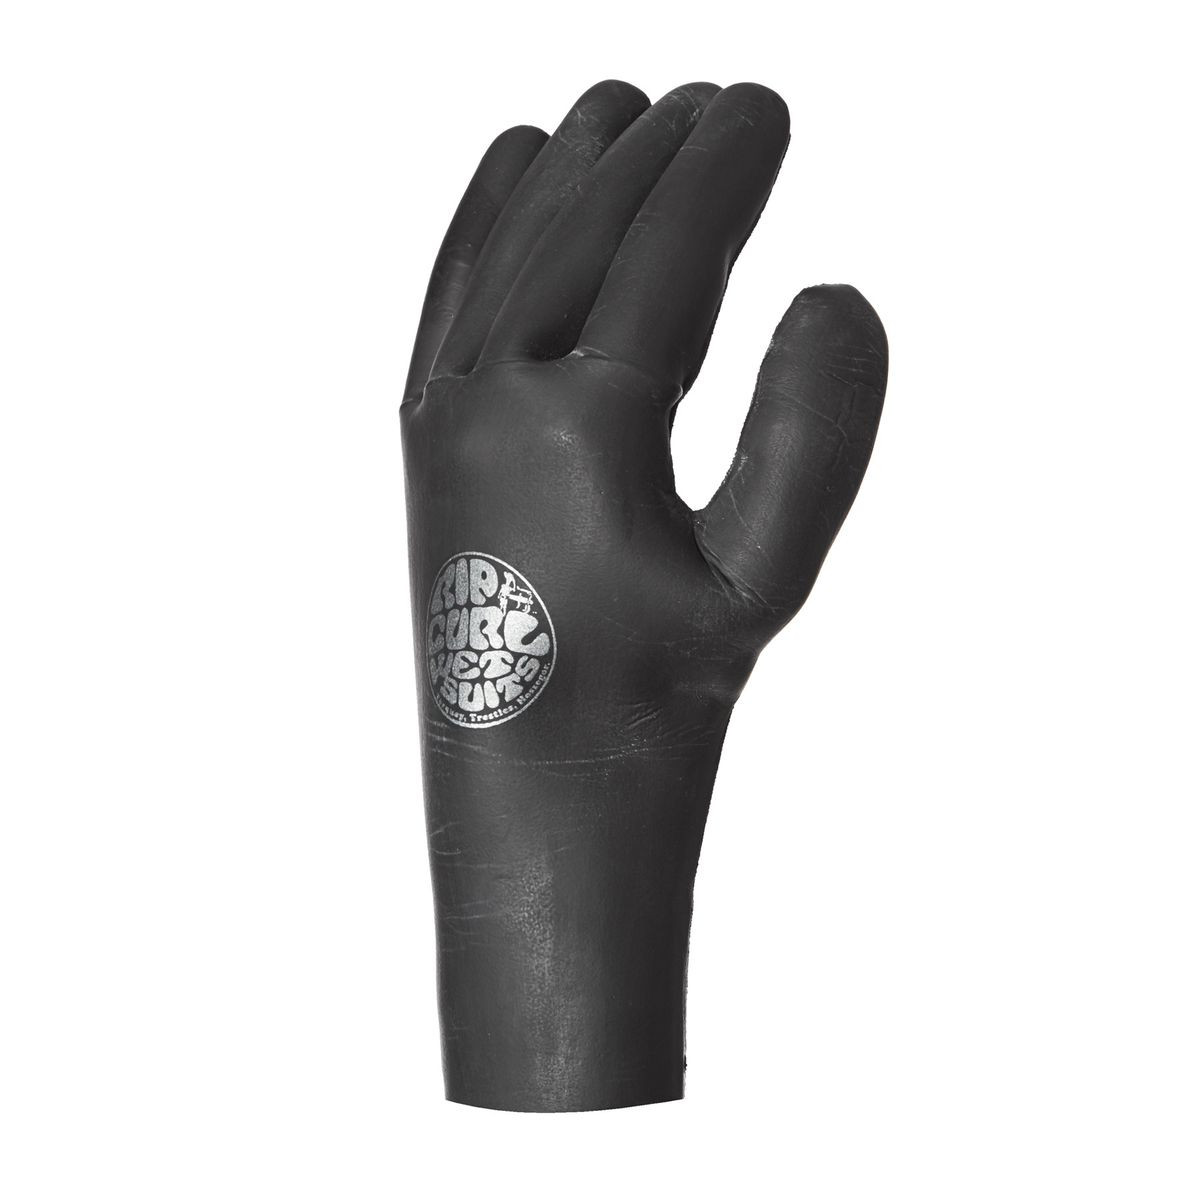 Rip Curl Rubber Soul 3mm 5 Finger Wetsuit Gloves - Black